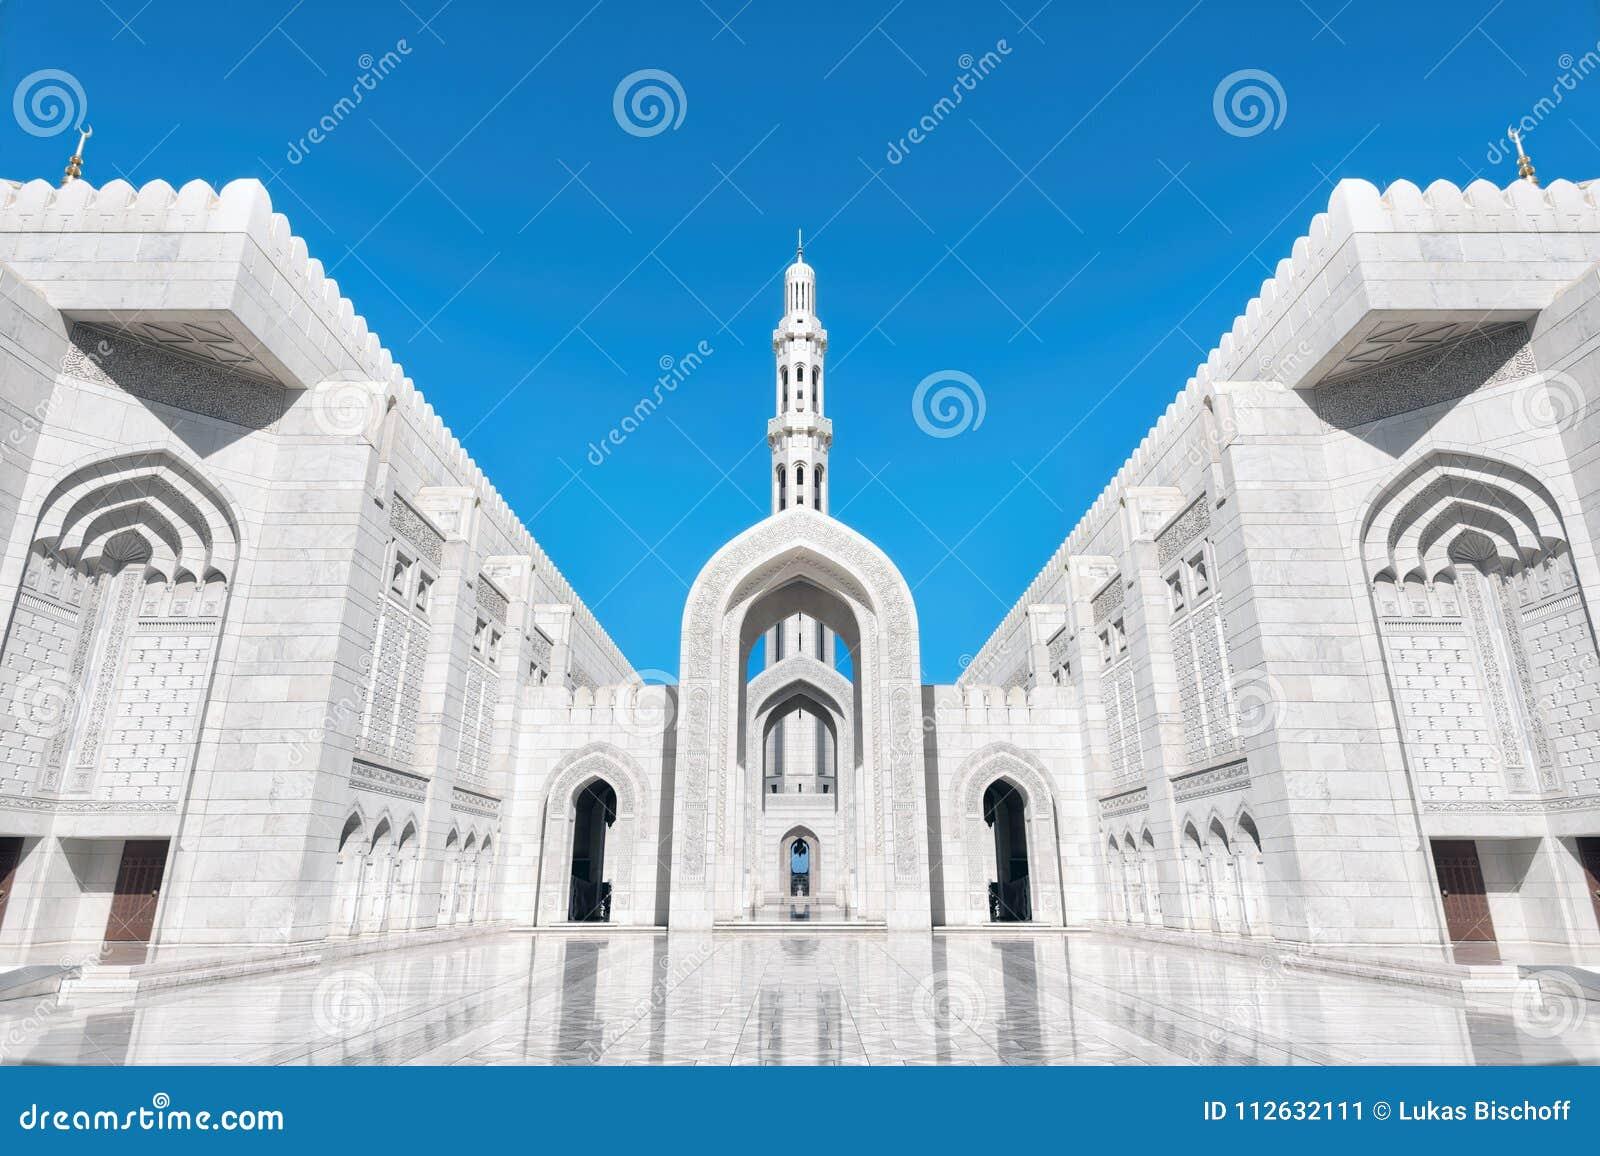 Sultan Qaboos Grand Mosque Muscat, Oman